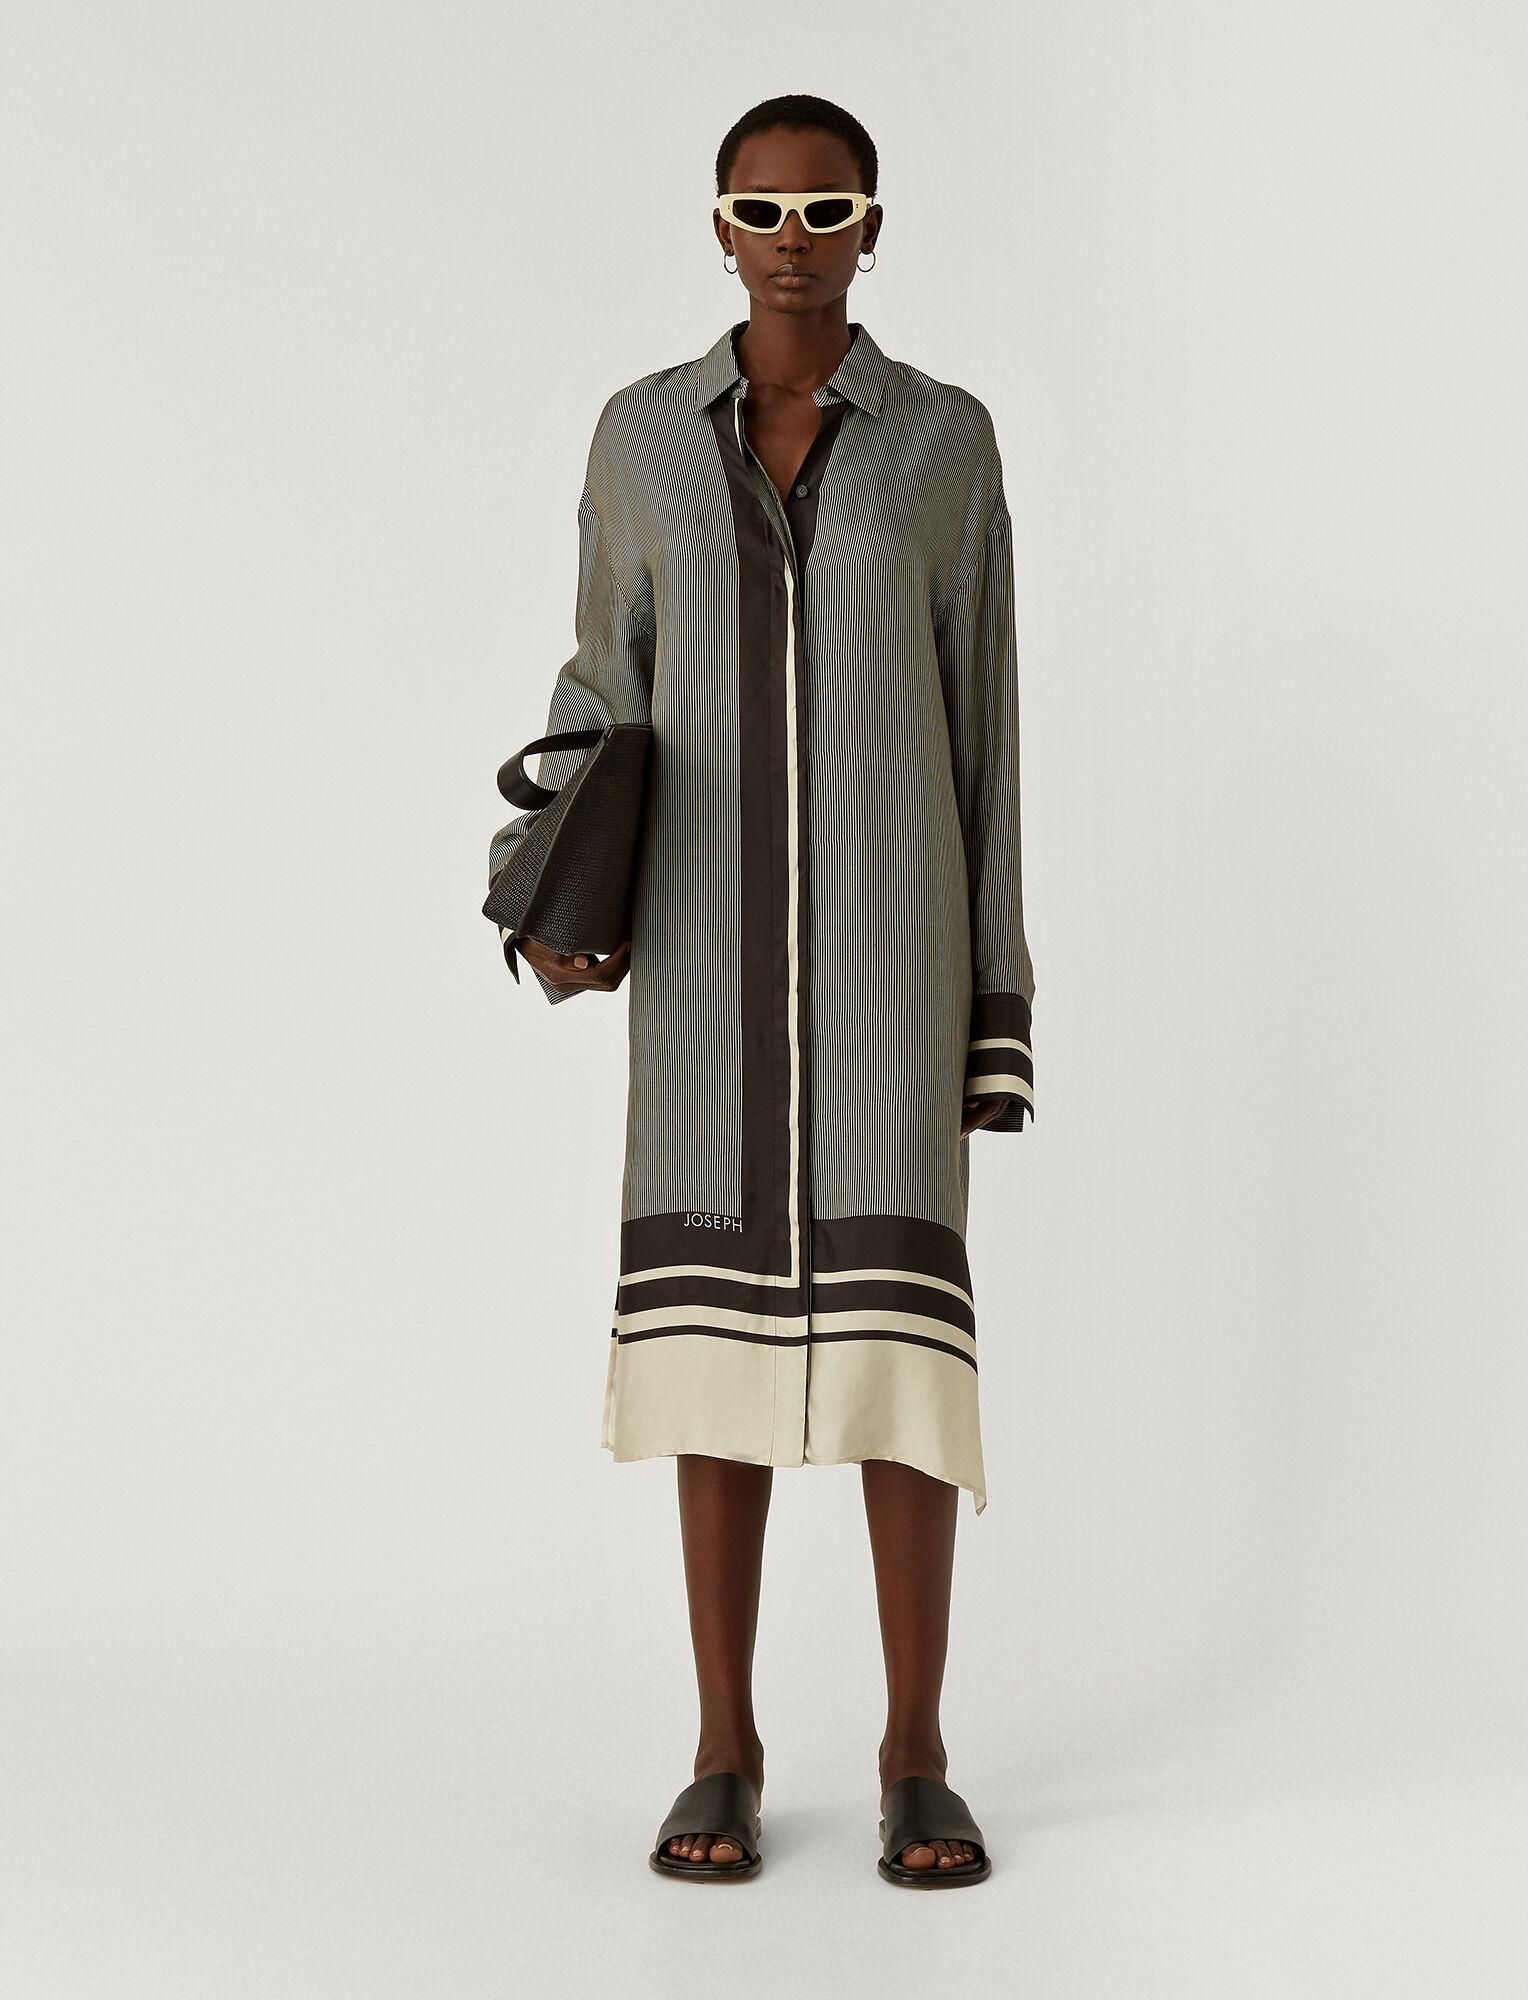 Joseph, Scarf Print Duras Dress, in BLACK/PORCELAIN